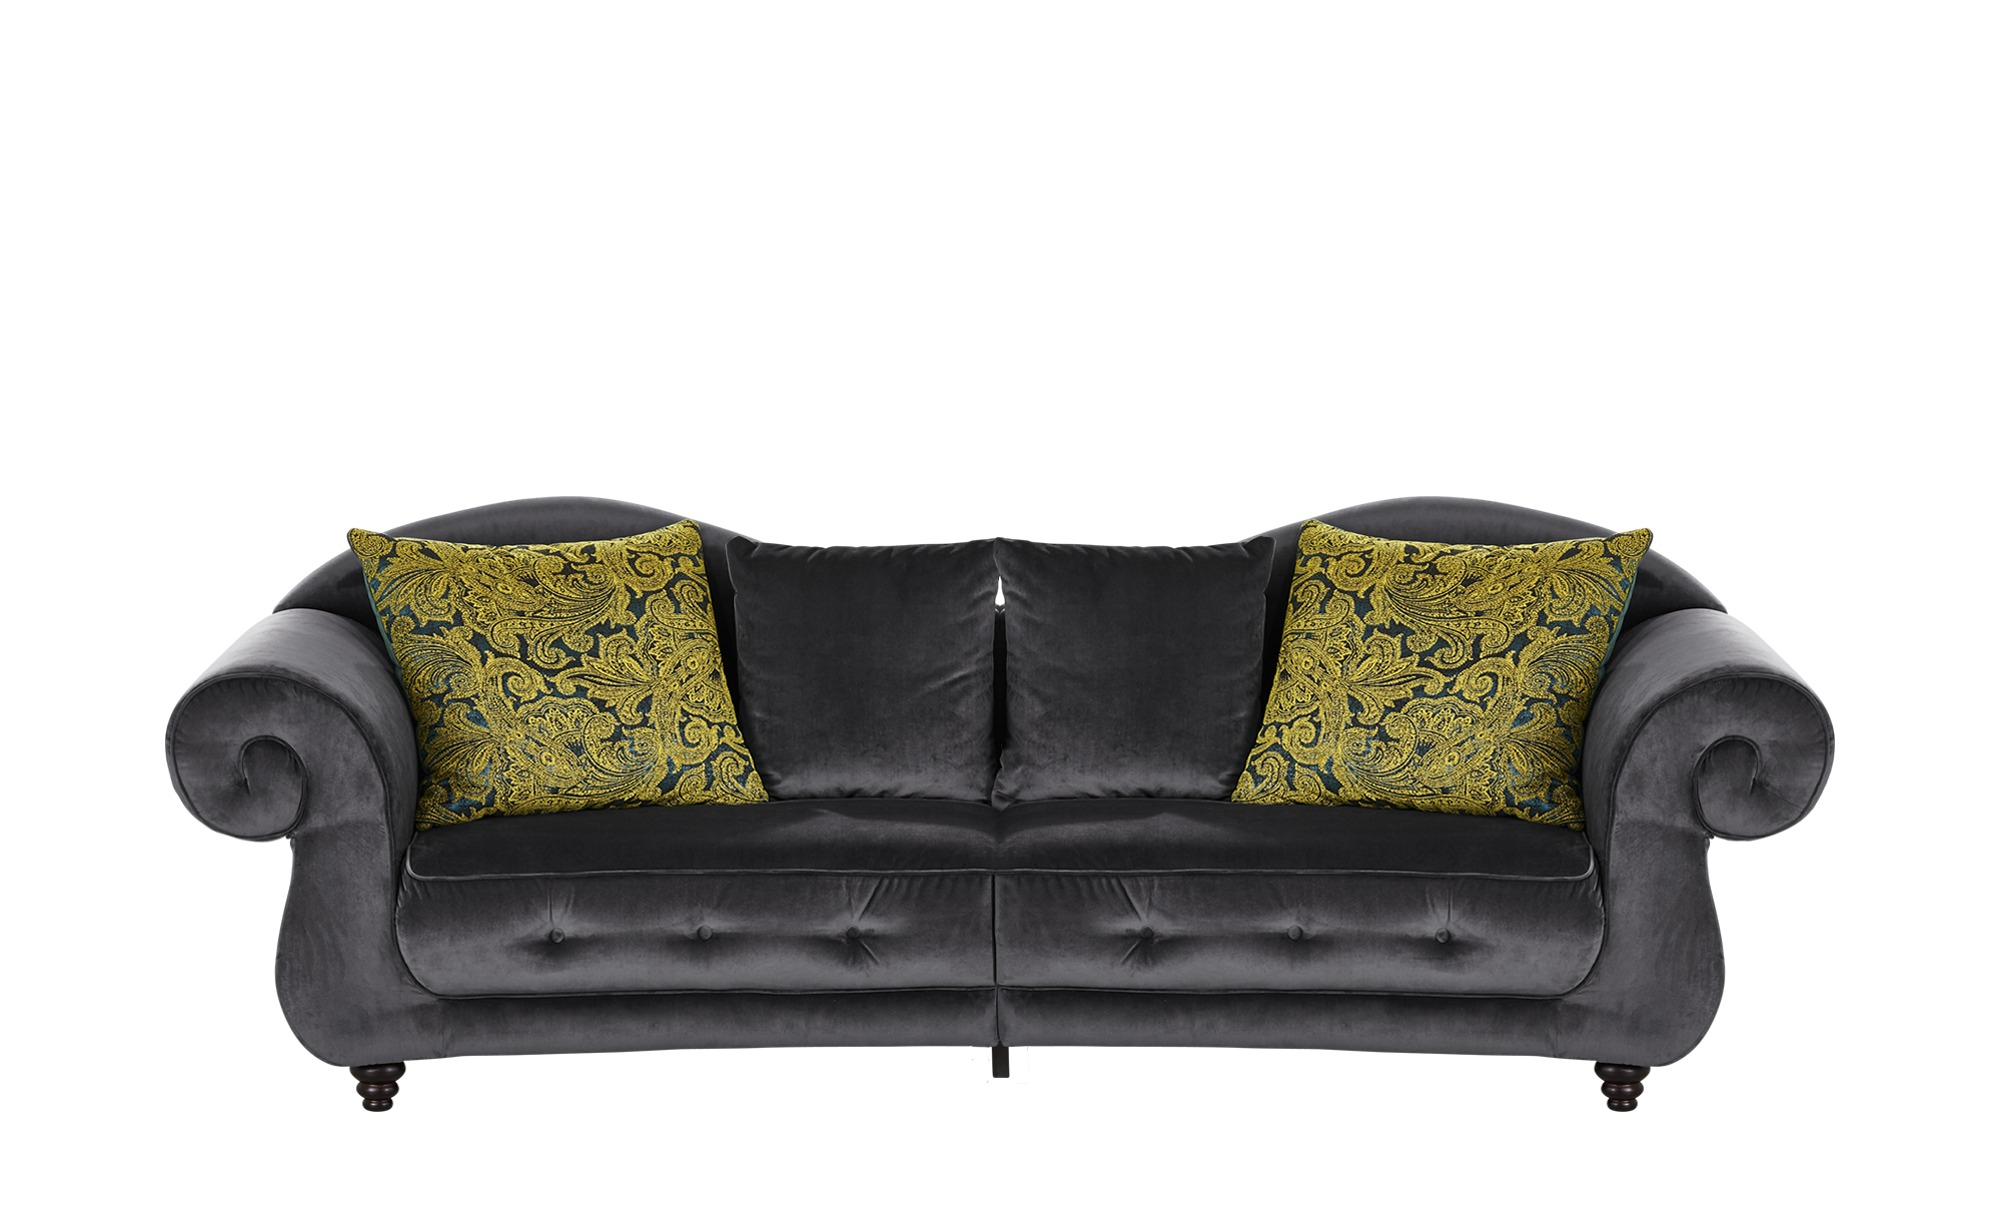 Design Big Sofa anthrazit - Mikrofaser Nobody ¦ grau ¦ Maße (cm): B: 288 H: 98 T: 110 Polstermöbel > Sofas > Big-Sofas - Höffner